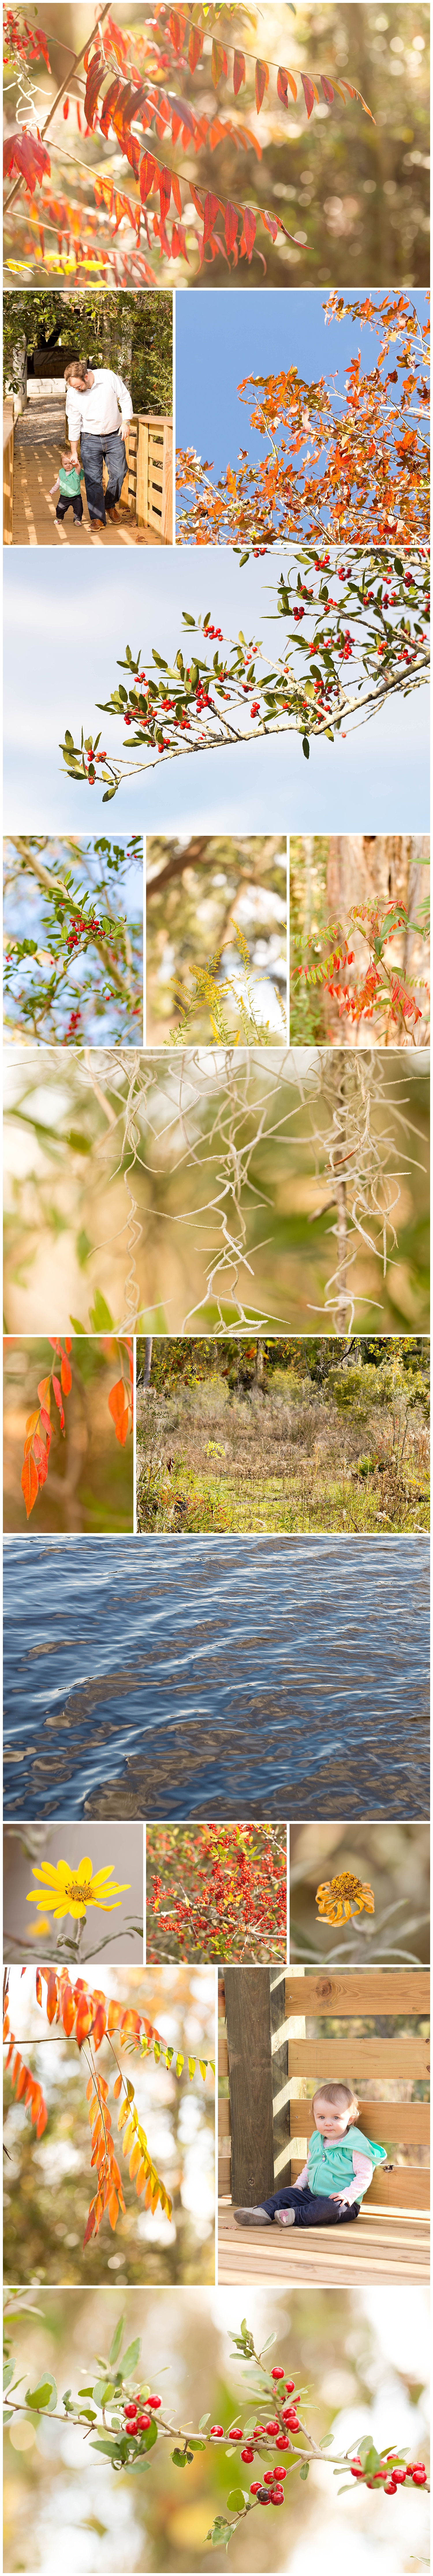 nature photography at Pascagoula River Audubon Center (Uninvented Colors Photography)